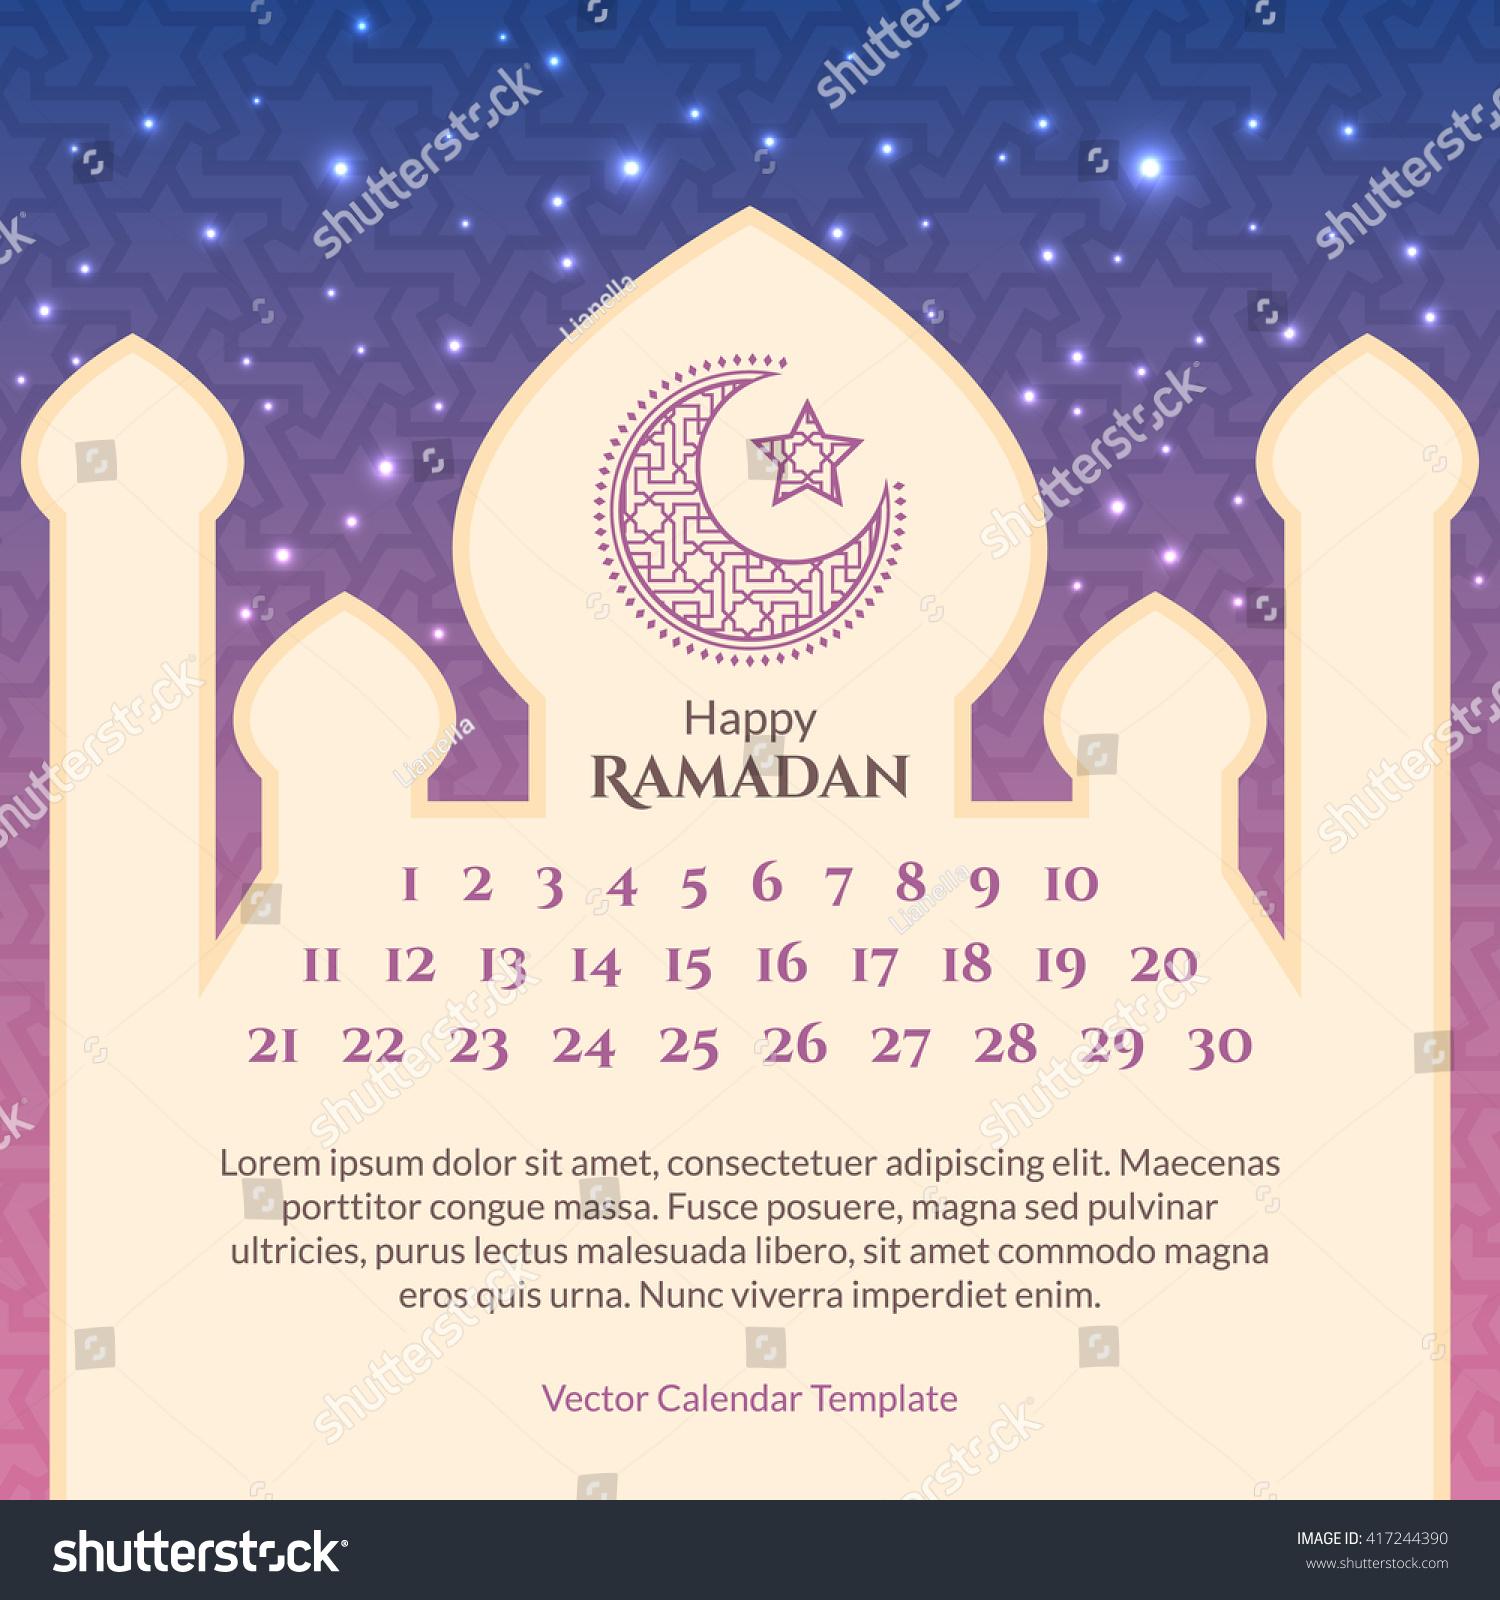 Ramadan Calendar Template Islamic Greeting Background Stock Vector ...